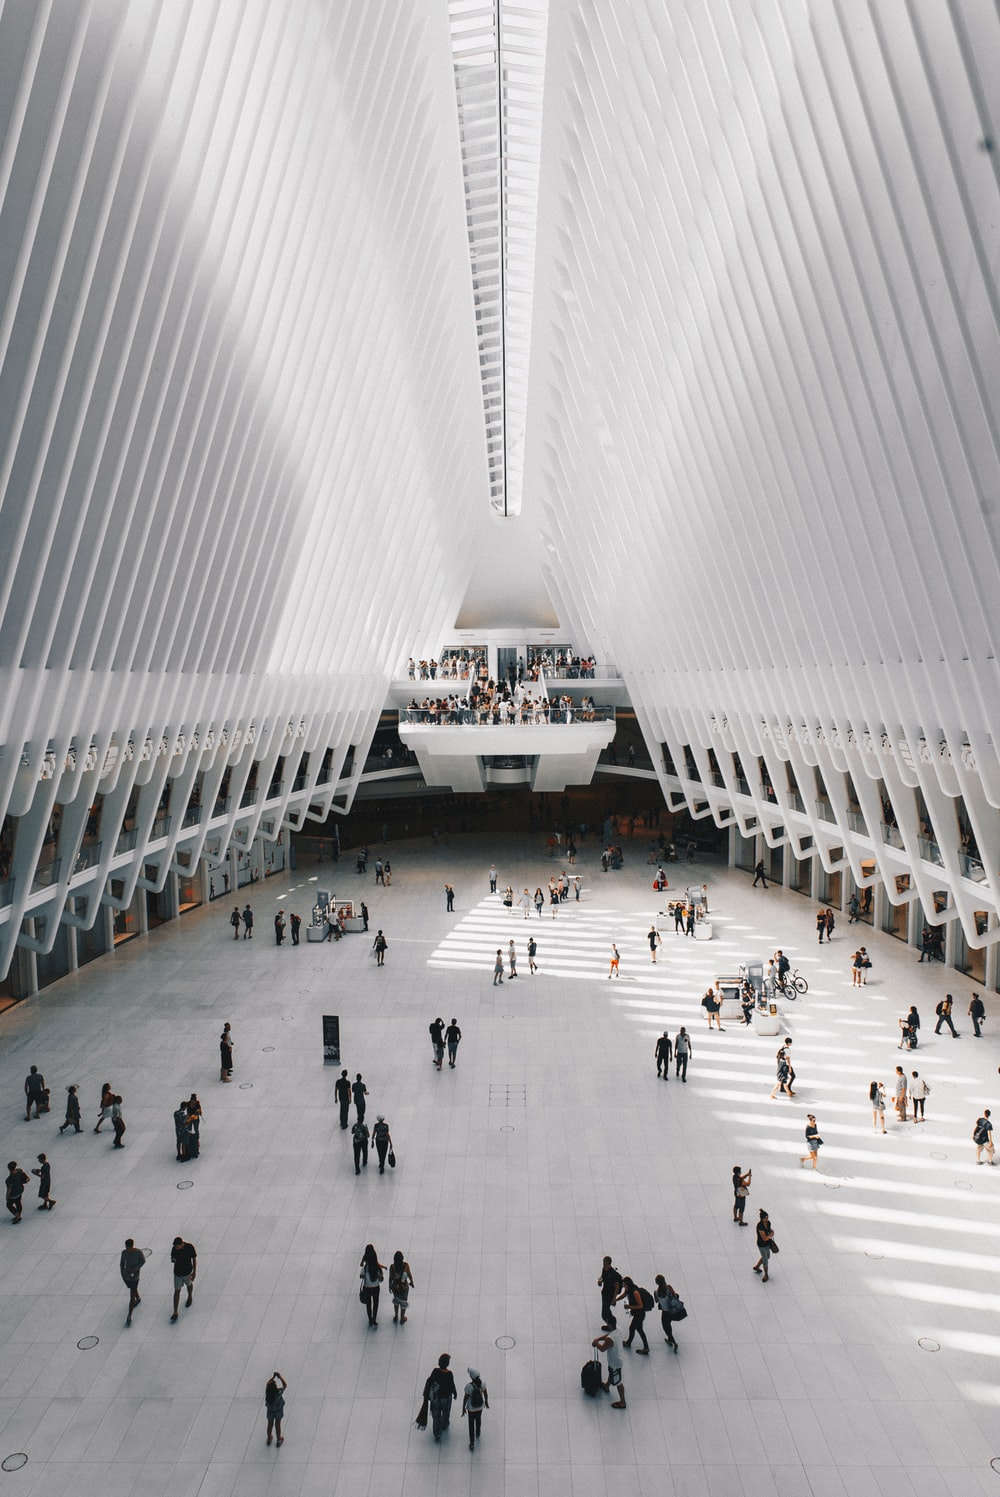 people walking inside white concrete building